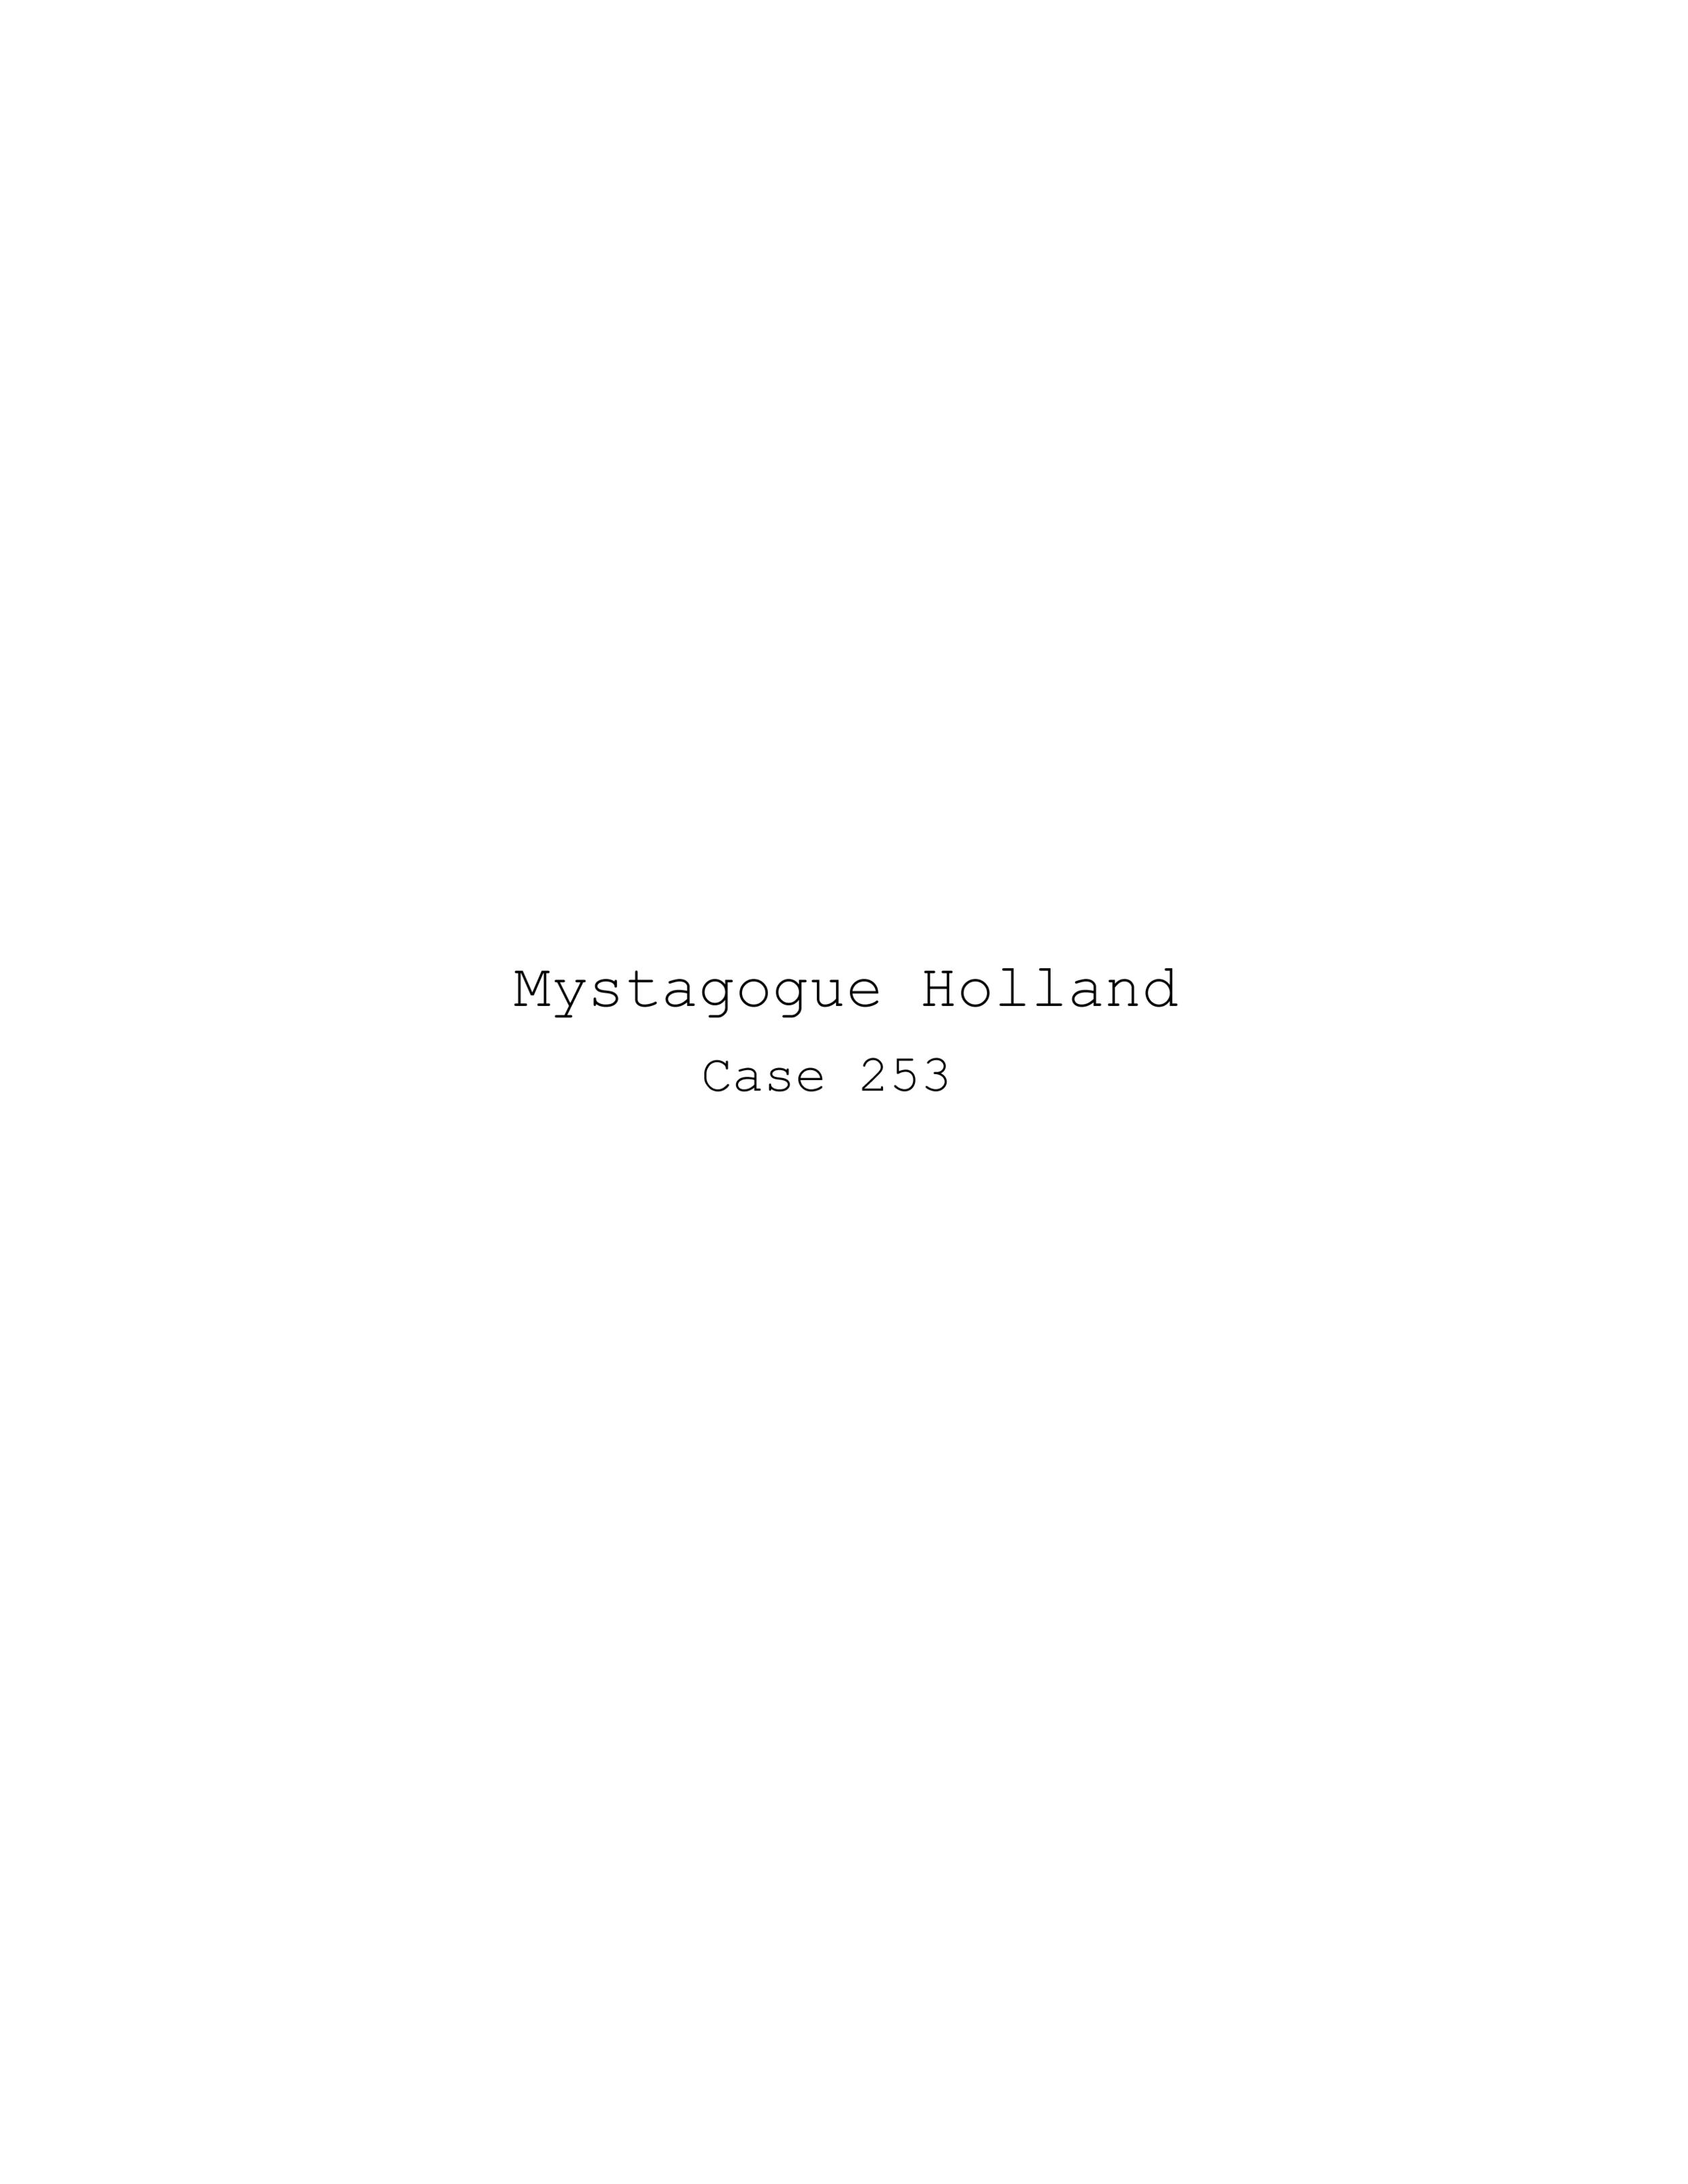 Mystagogue.png